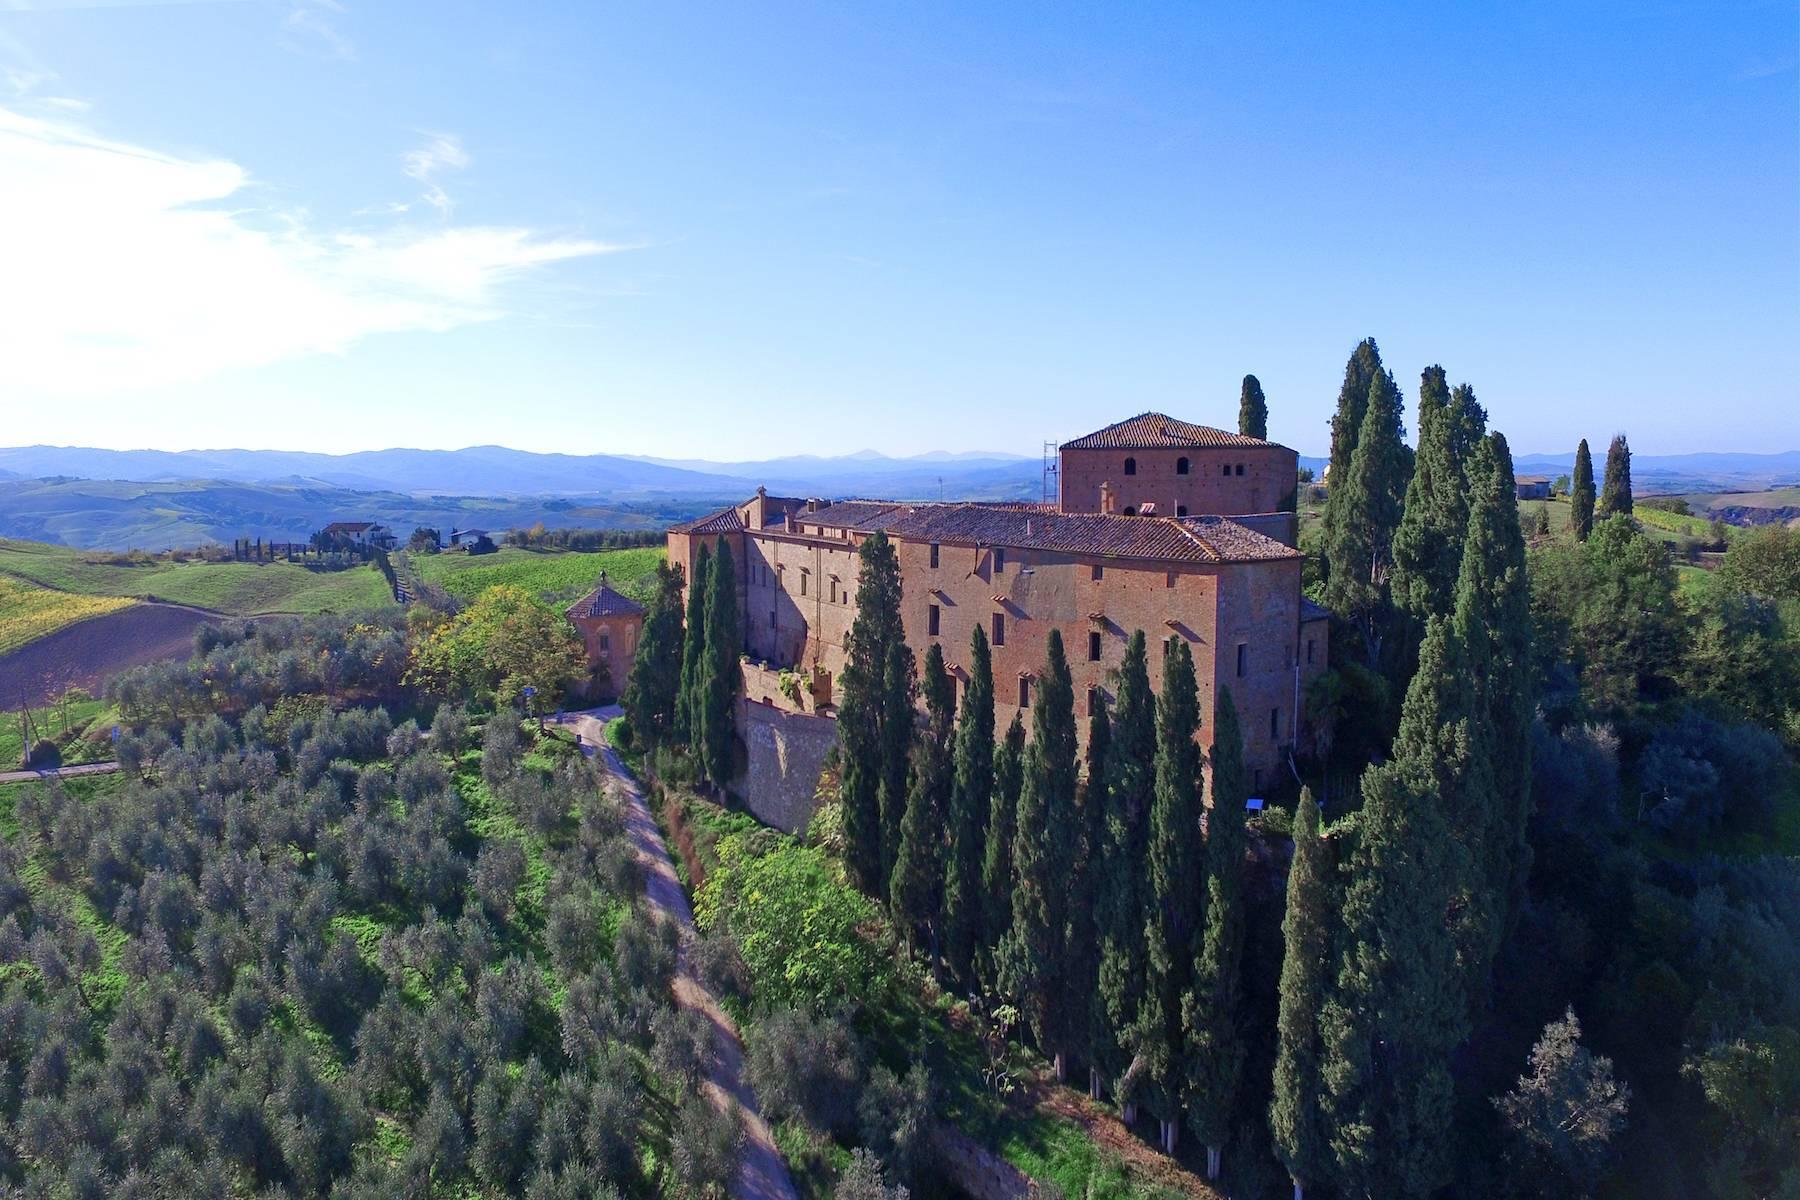 Wunderschönes Schloss im Herzen der Toskana - 1